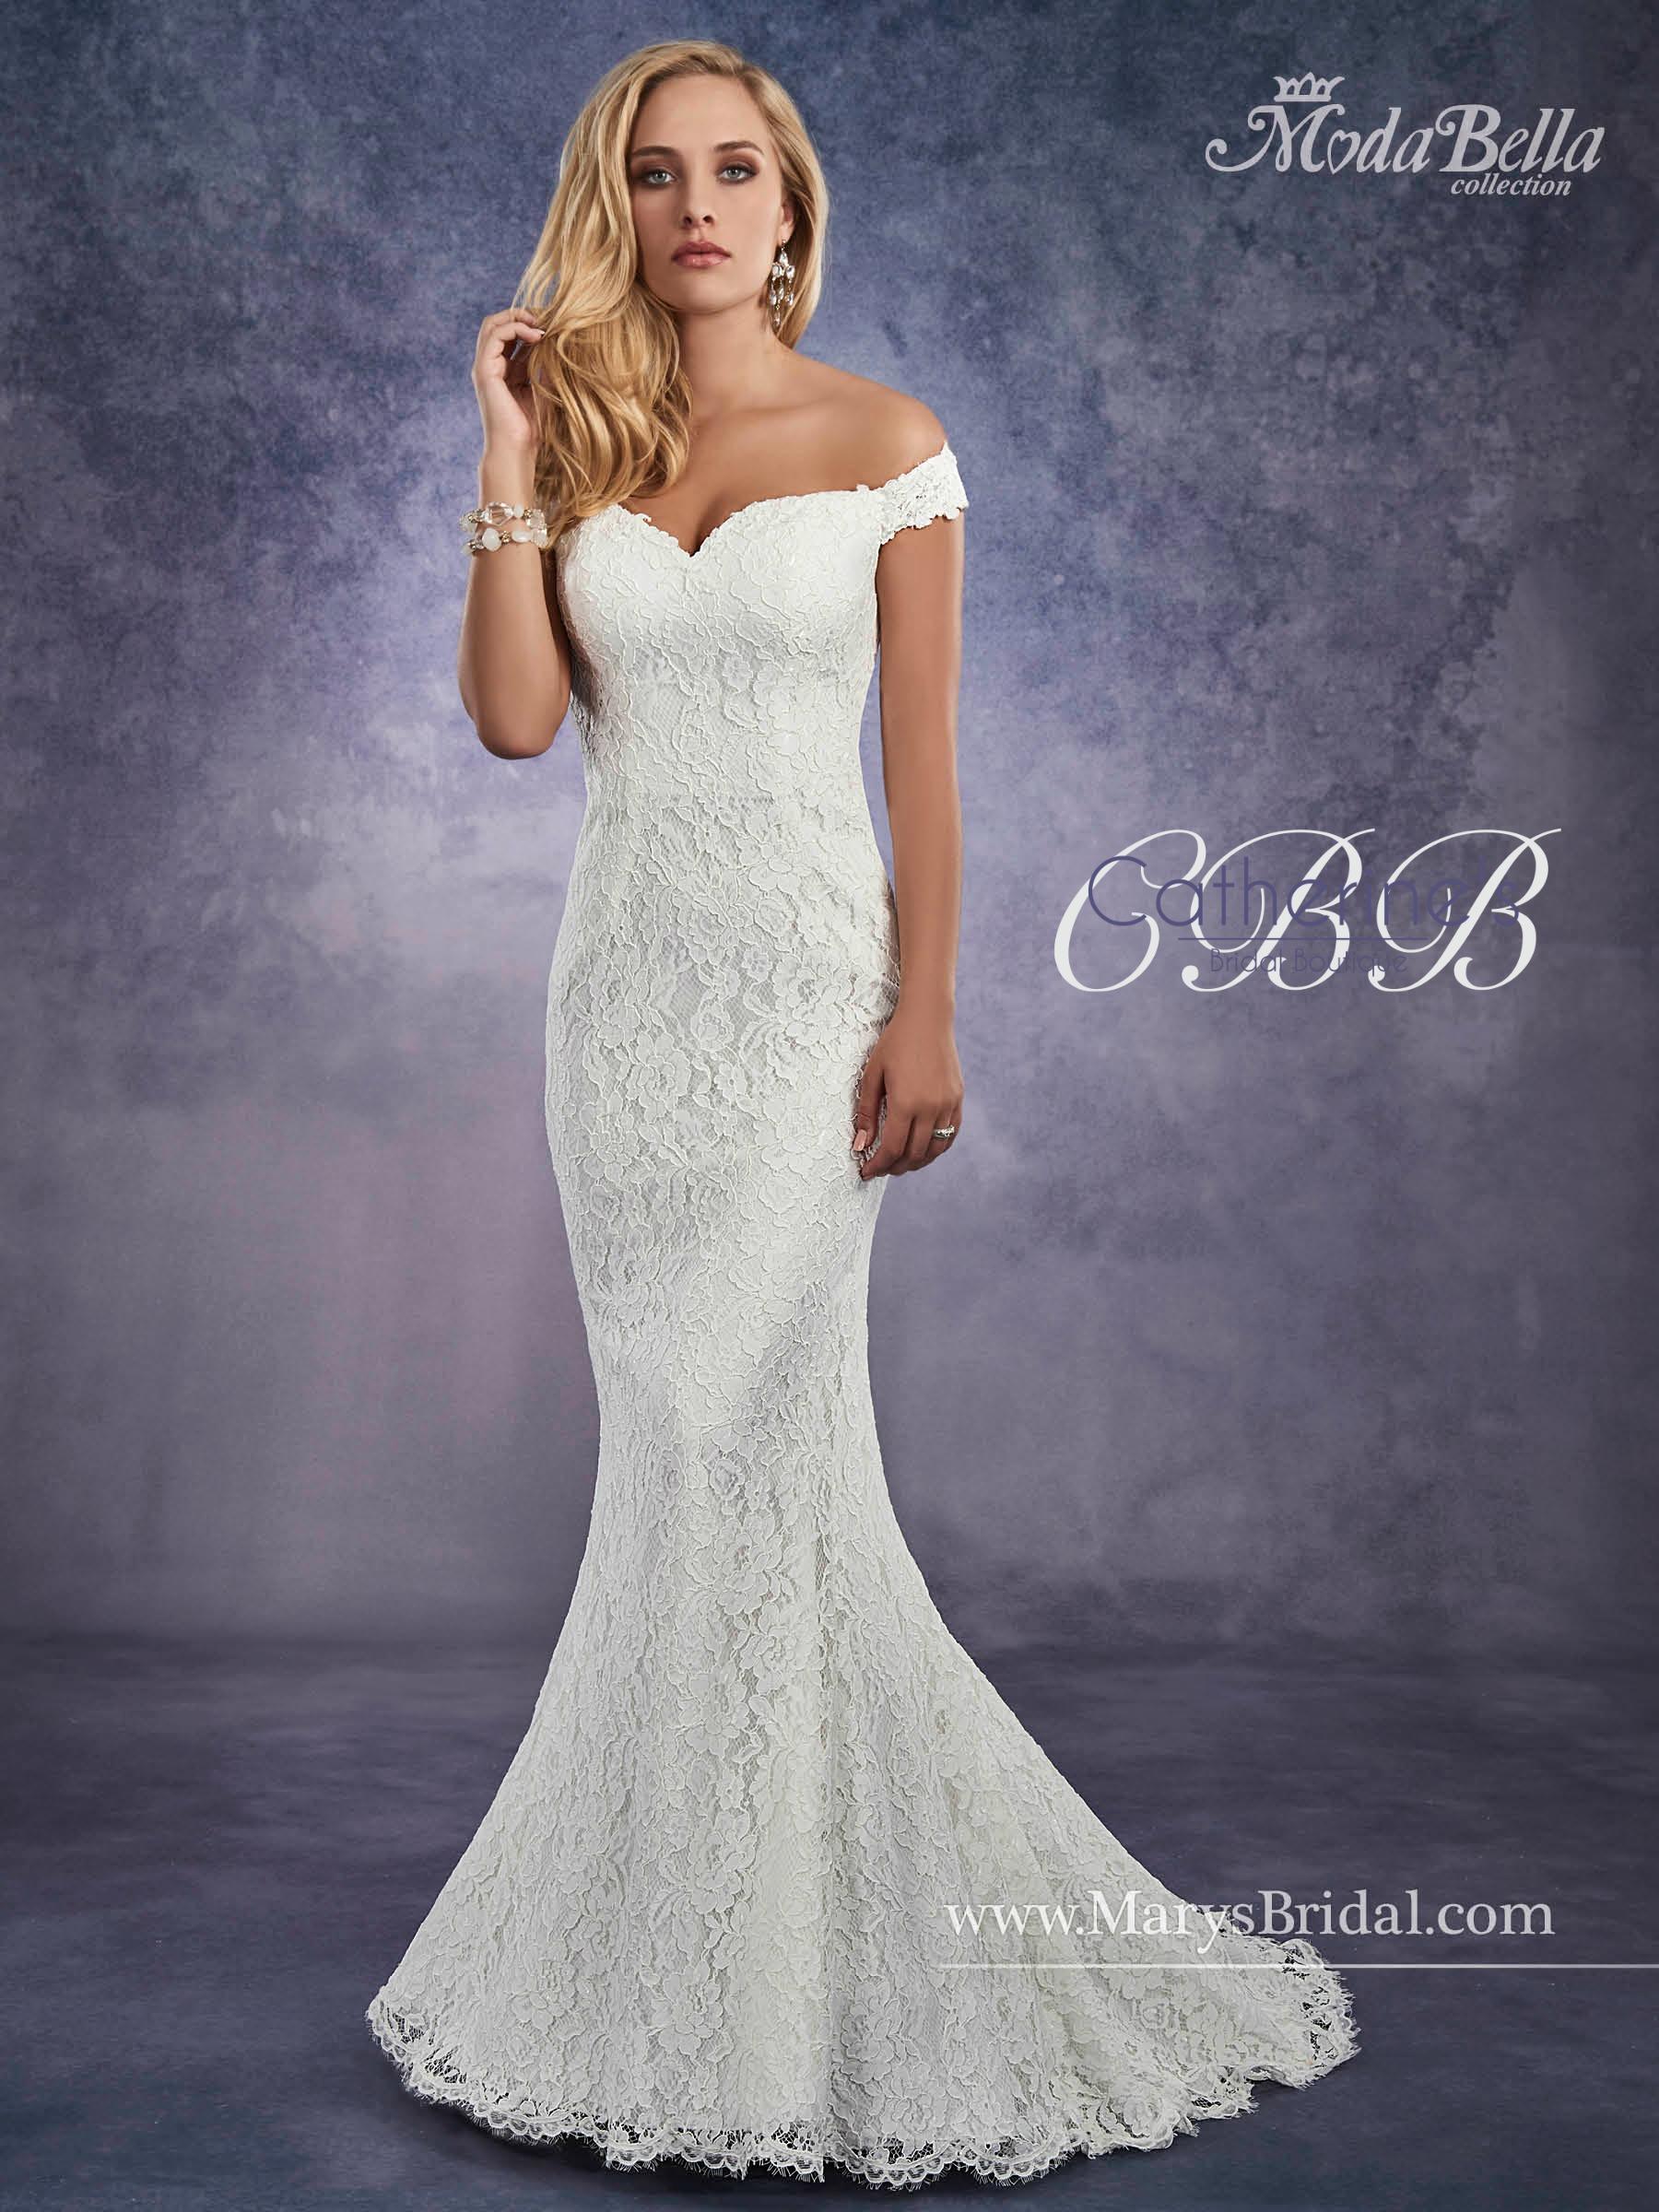 Mary's Bridal style #6539